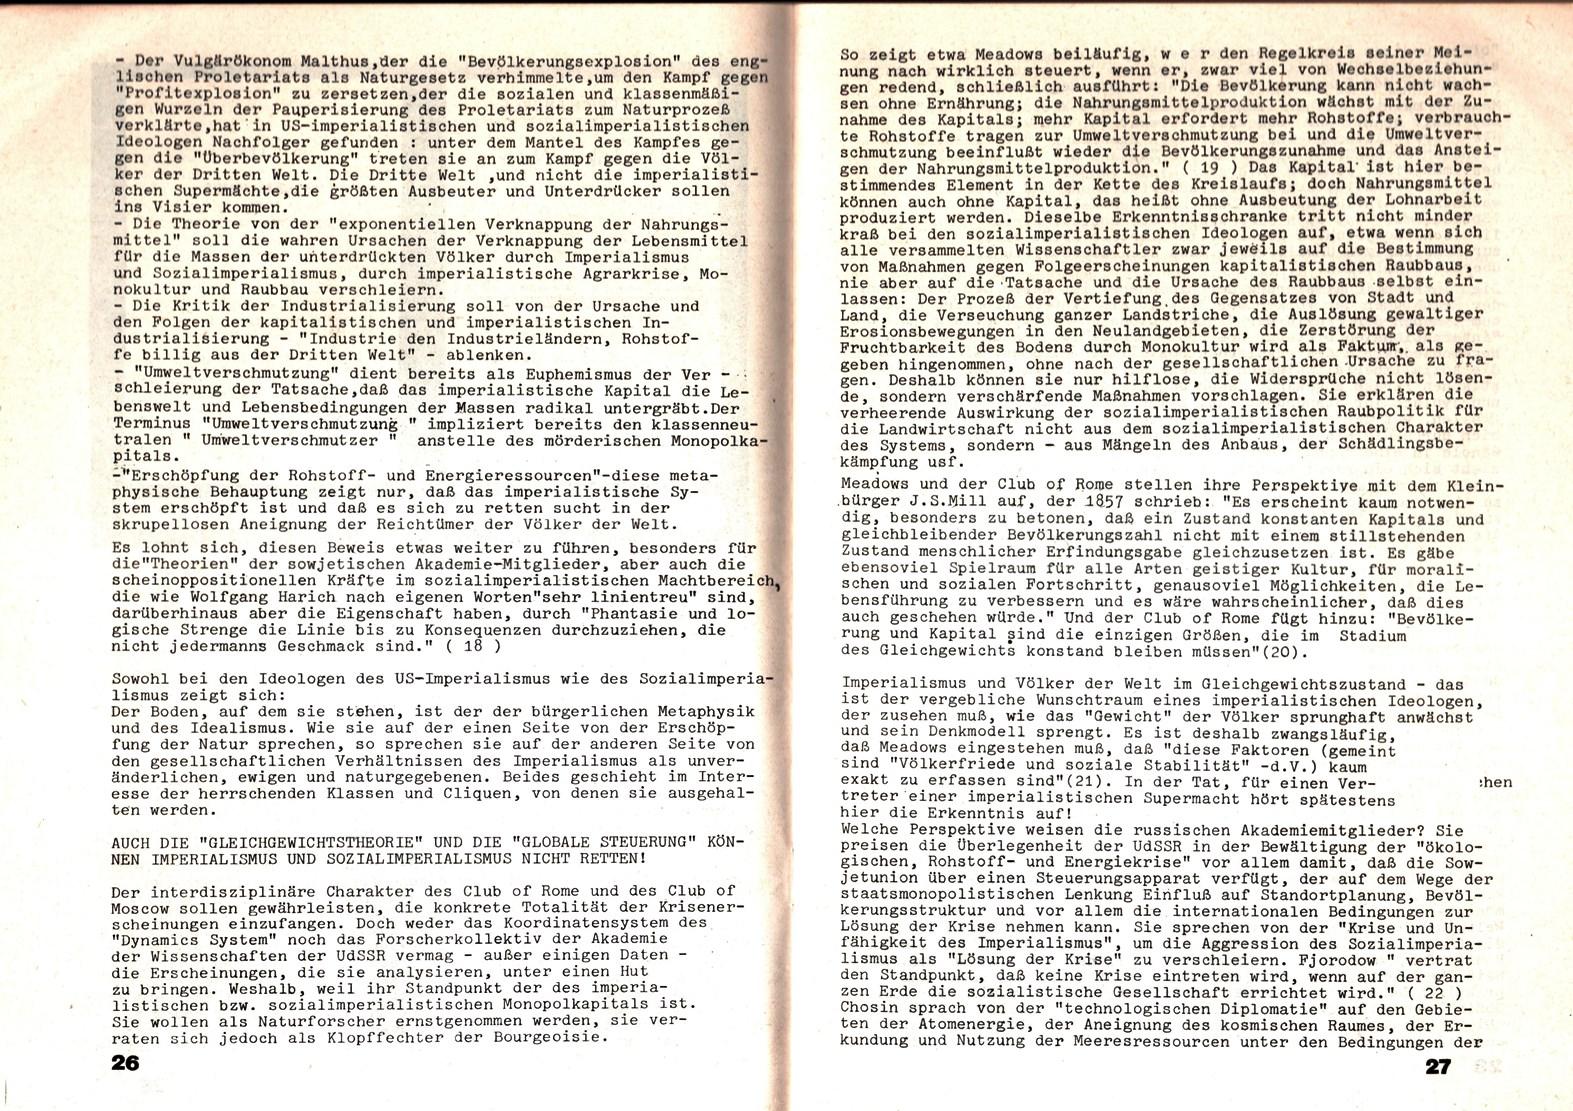 KSV_1976_Atomenergie_im_Kapitalismus_015